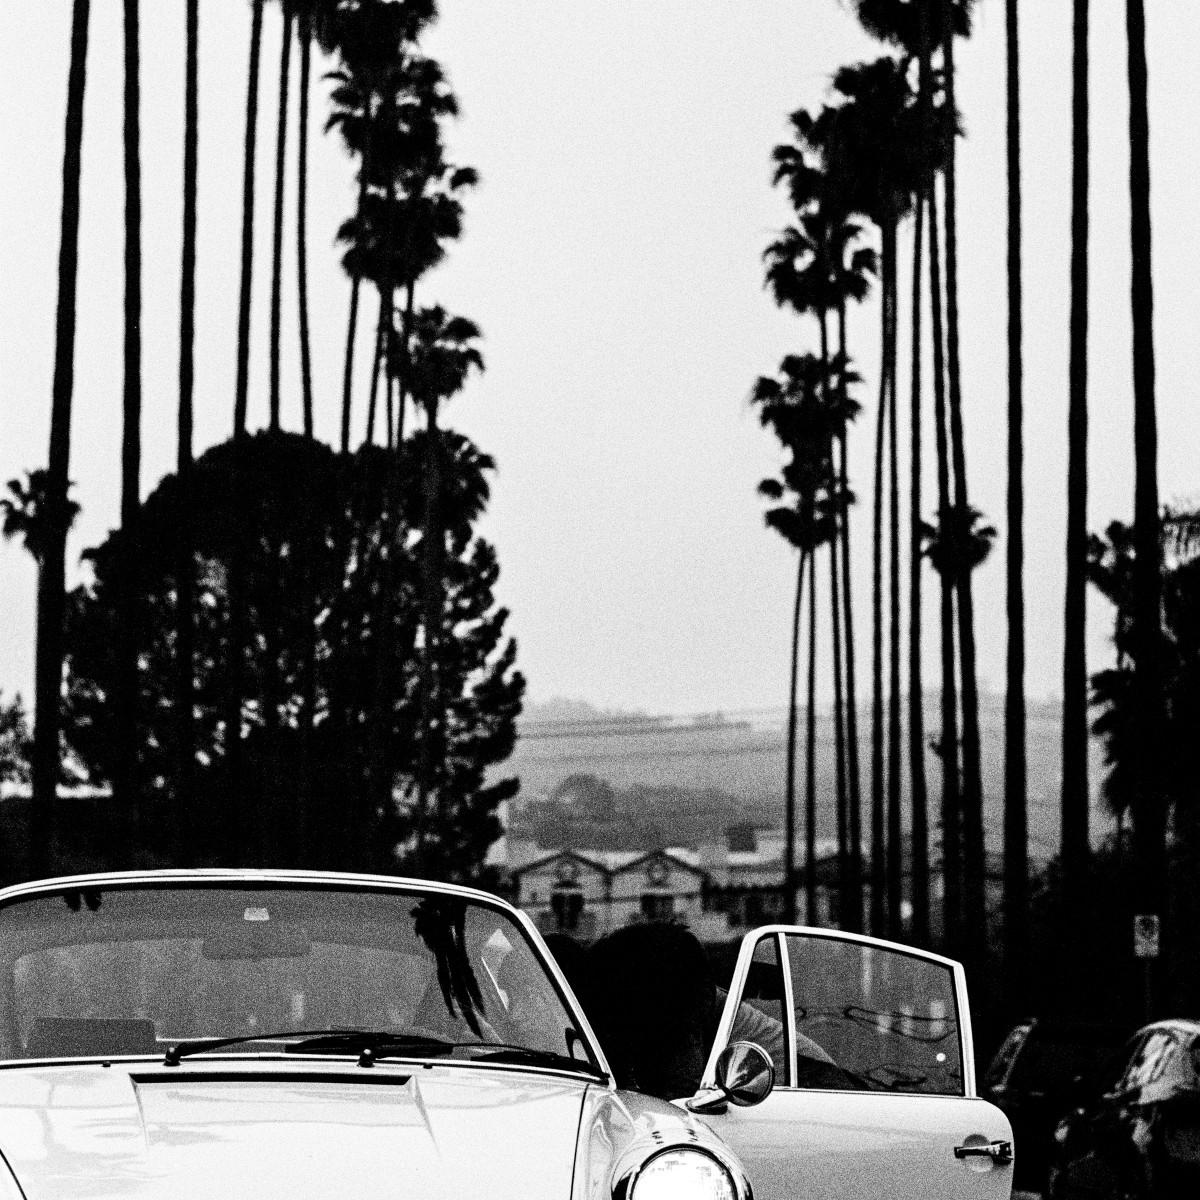 Porsche photo by Bart Kuykens